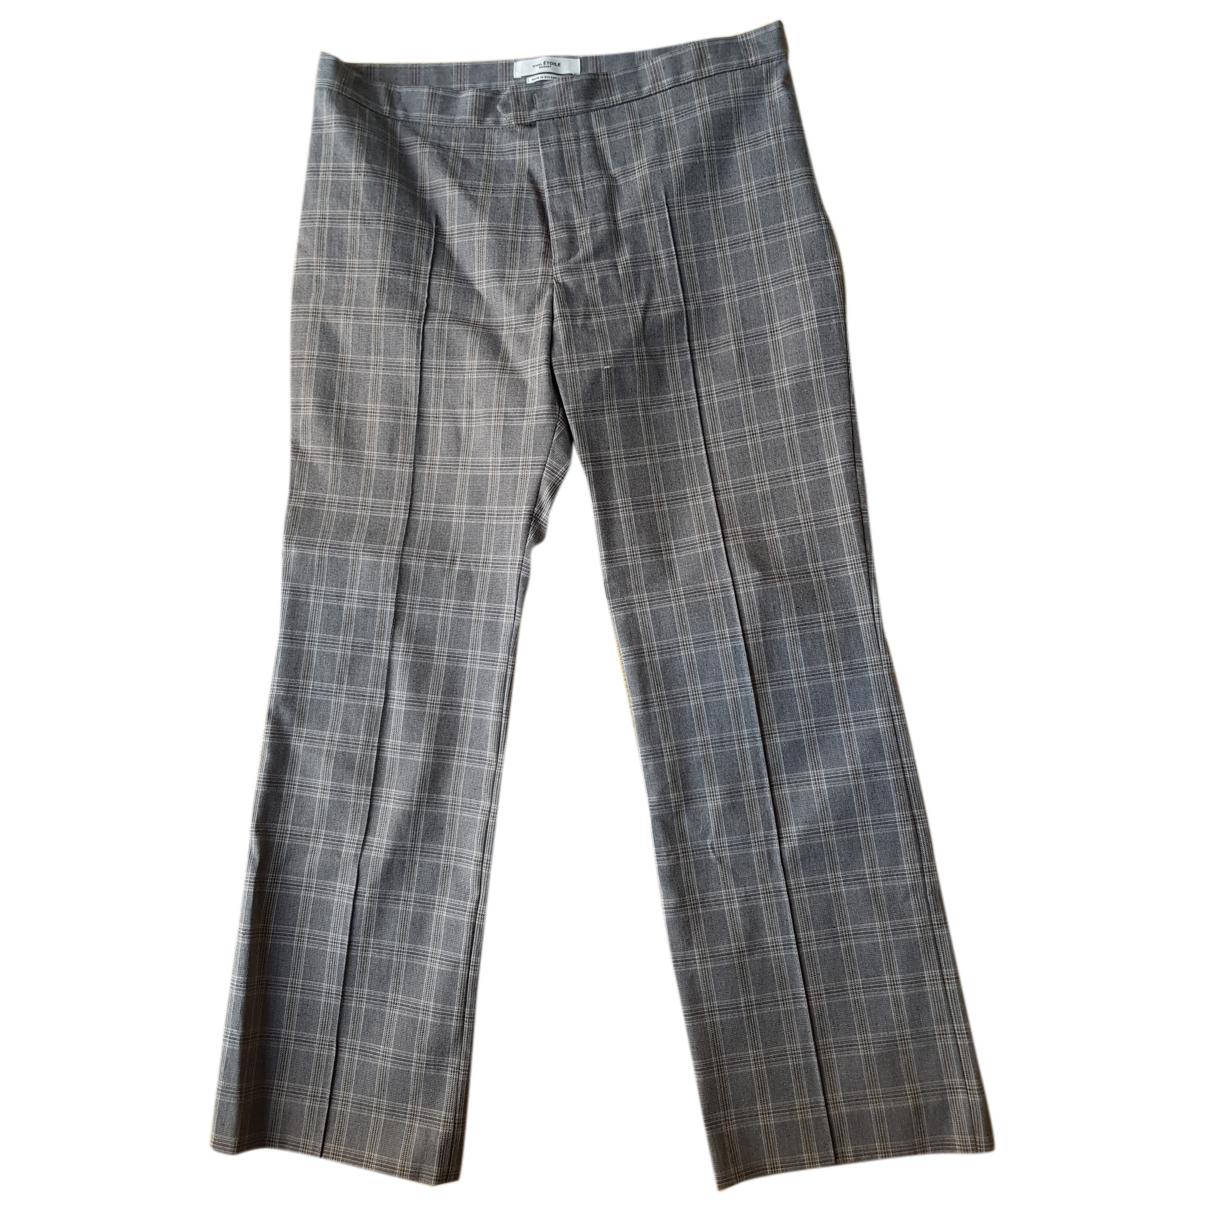 Isabel Marant Etoile N Beige Cotton Trousers for Women 38 FR